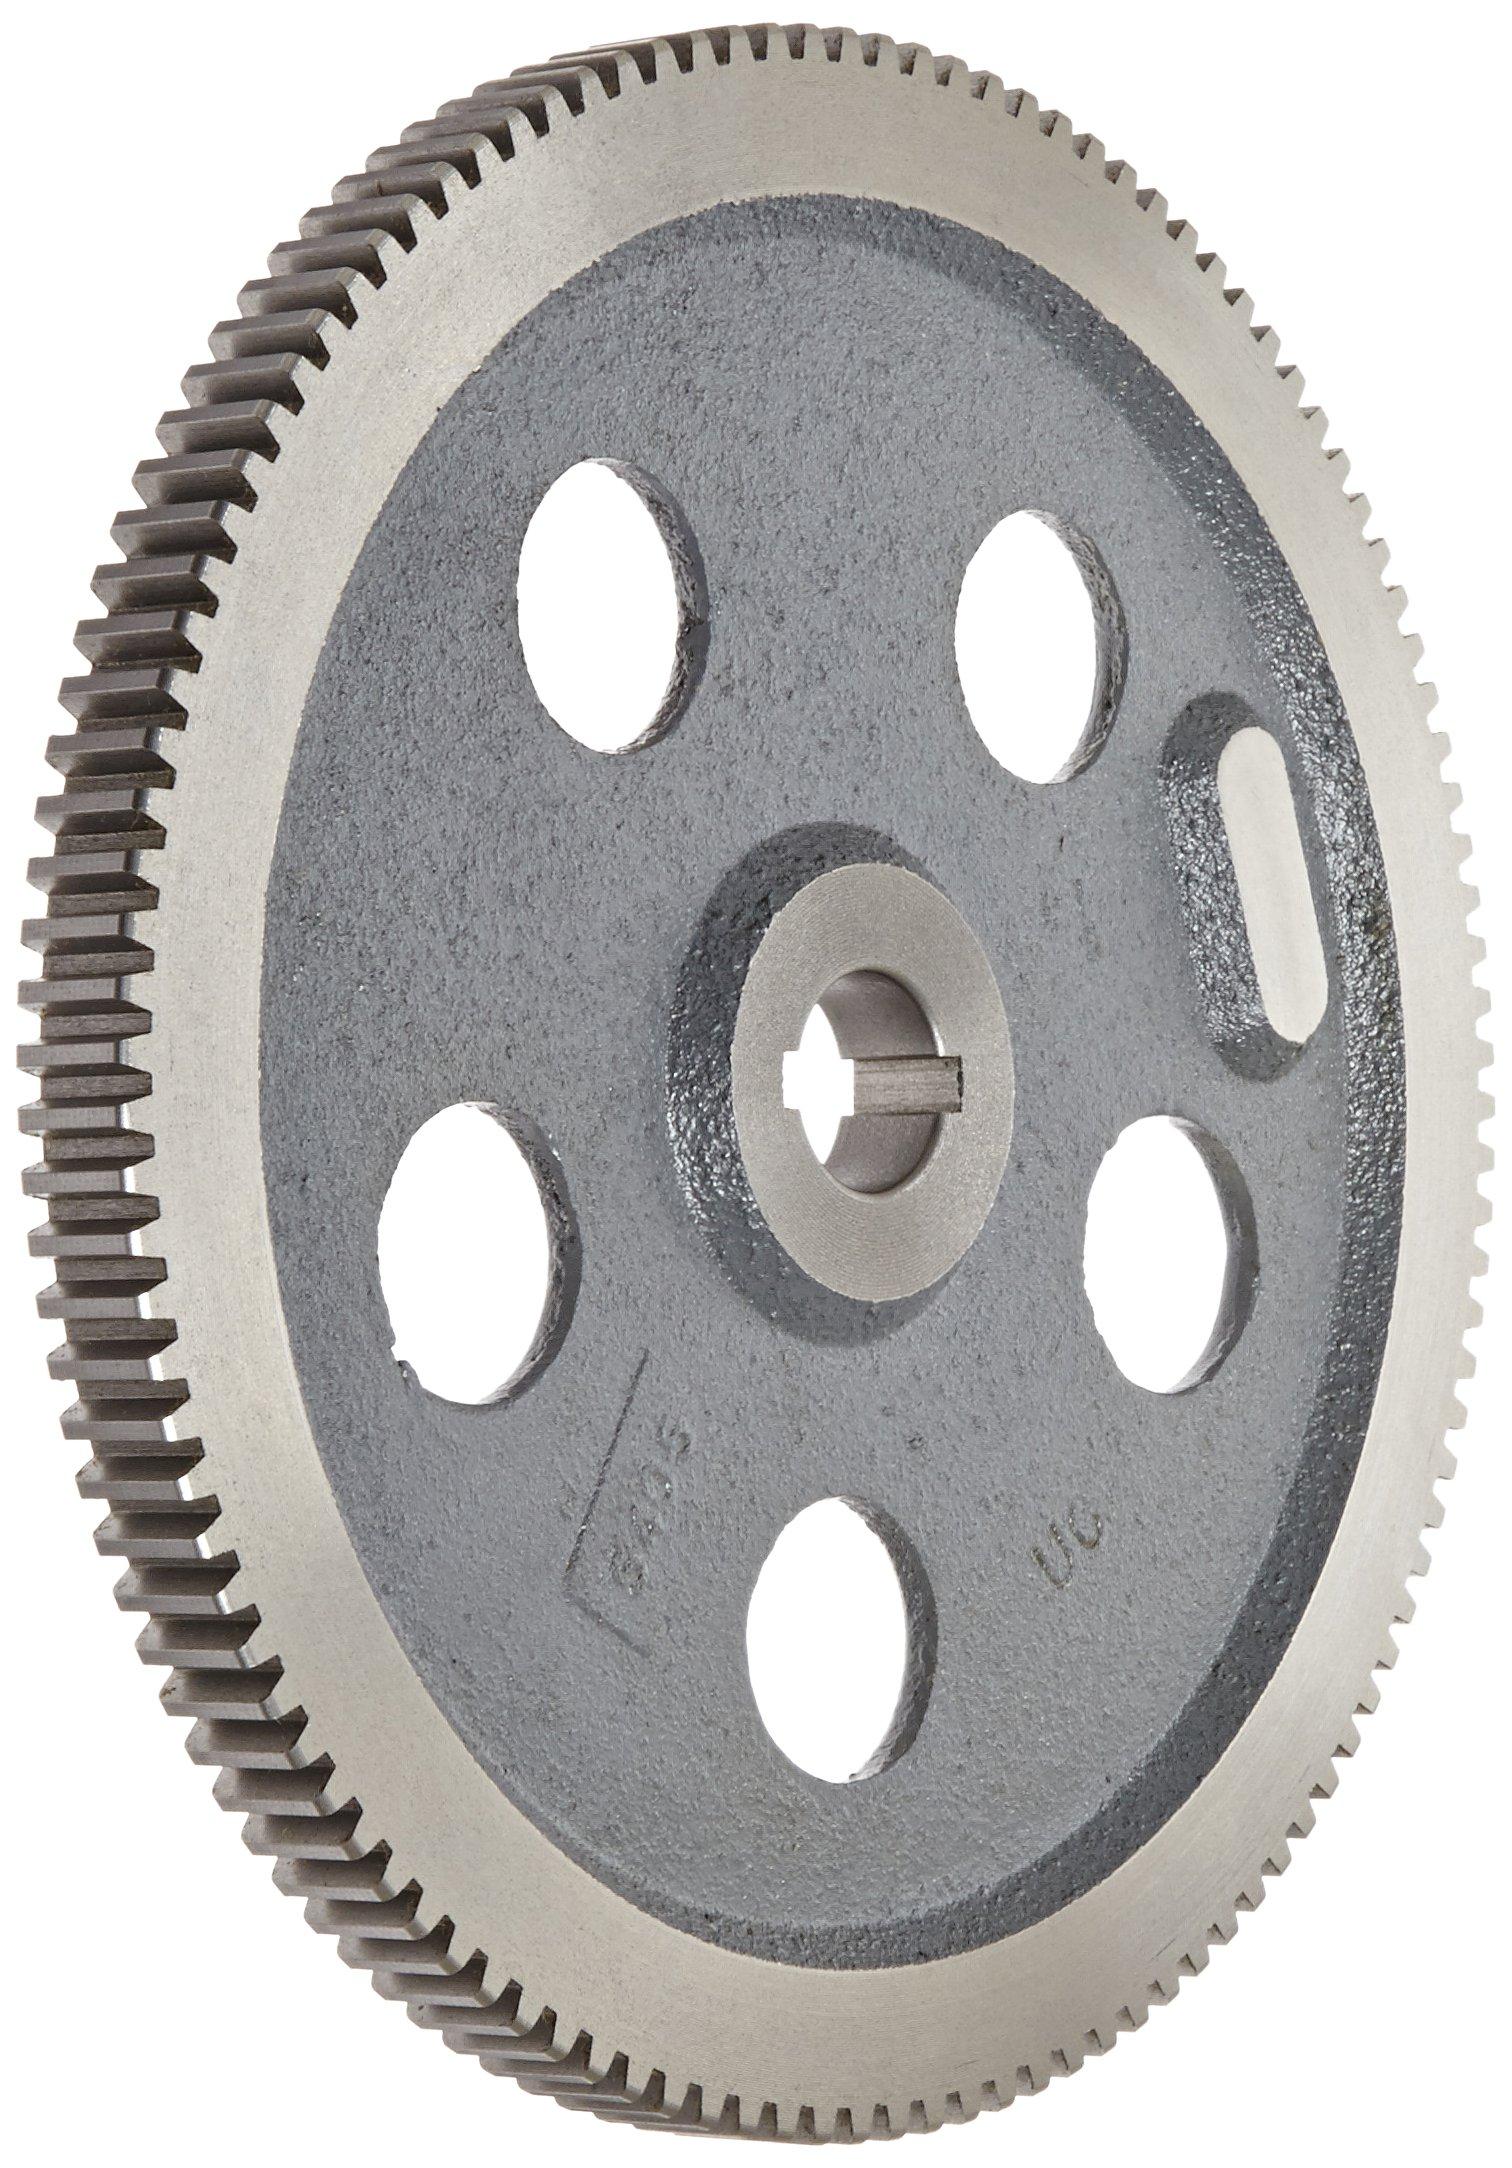 0.750 Bore Boston Gear GB44B Plain Change Gear 14.5 Degree Pressure Angle Cast Iron 16 Pitch 44 Teeth